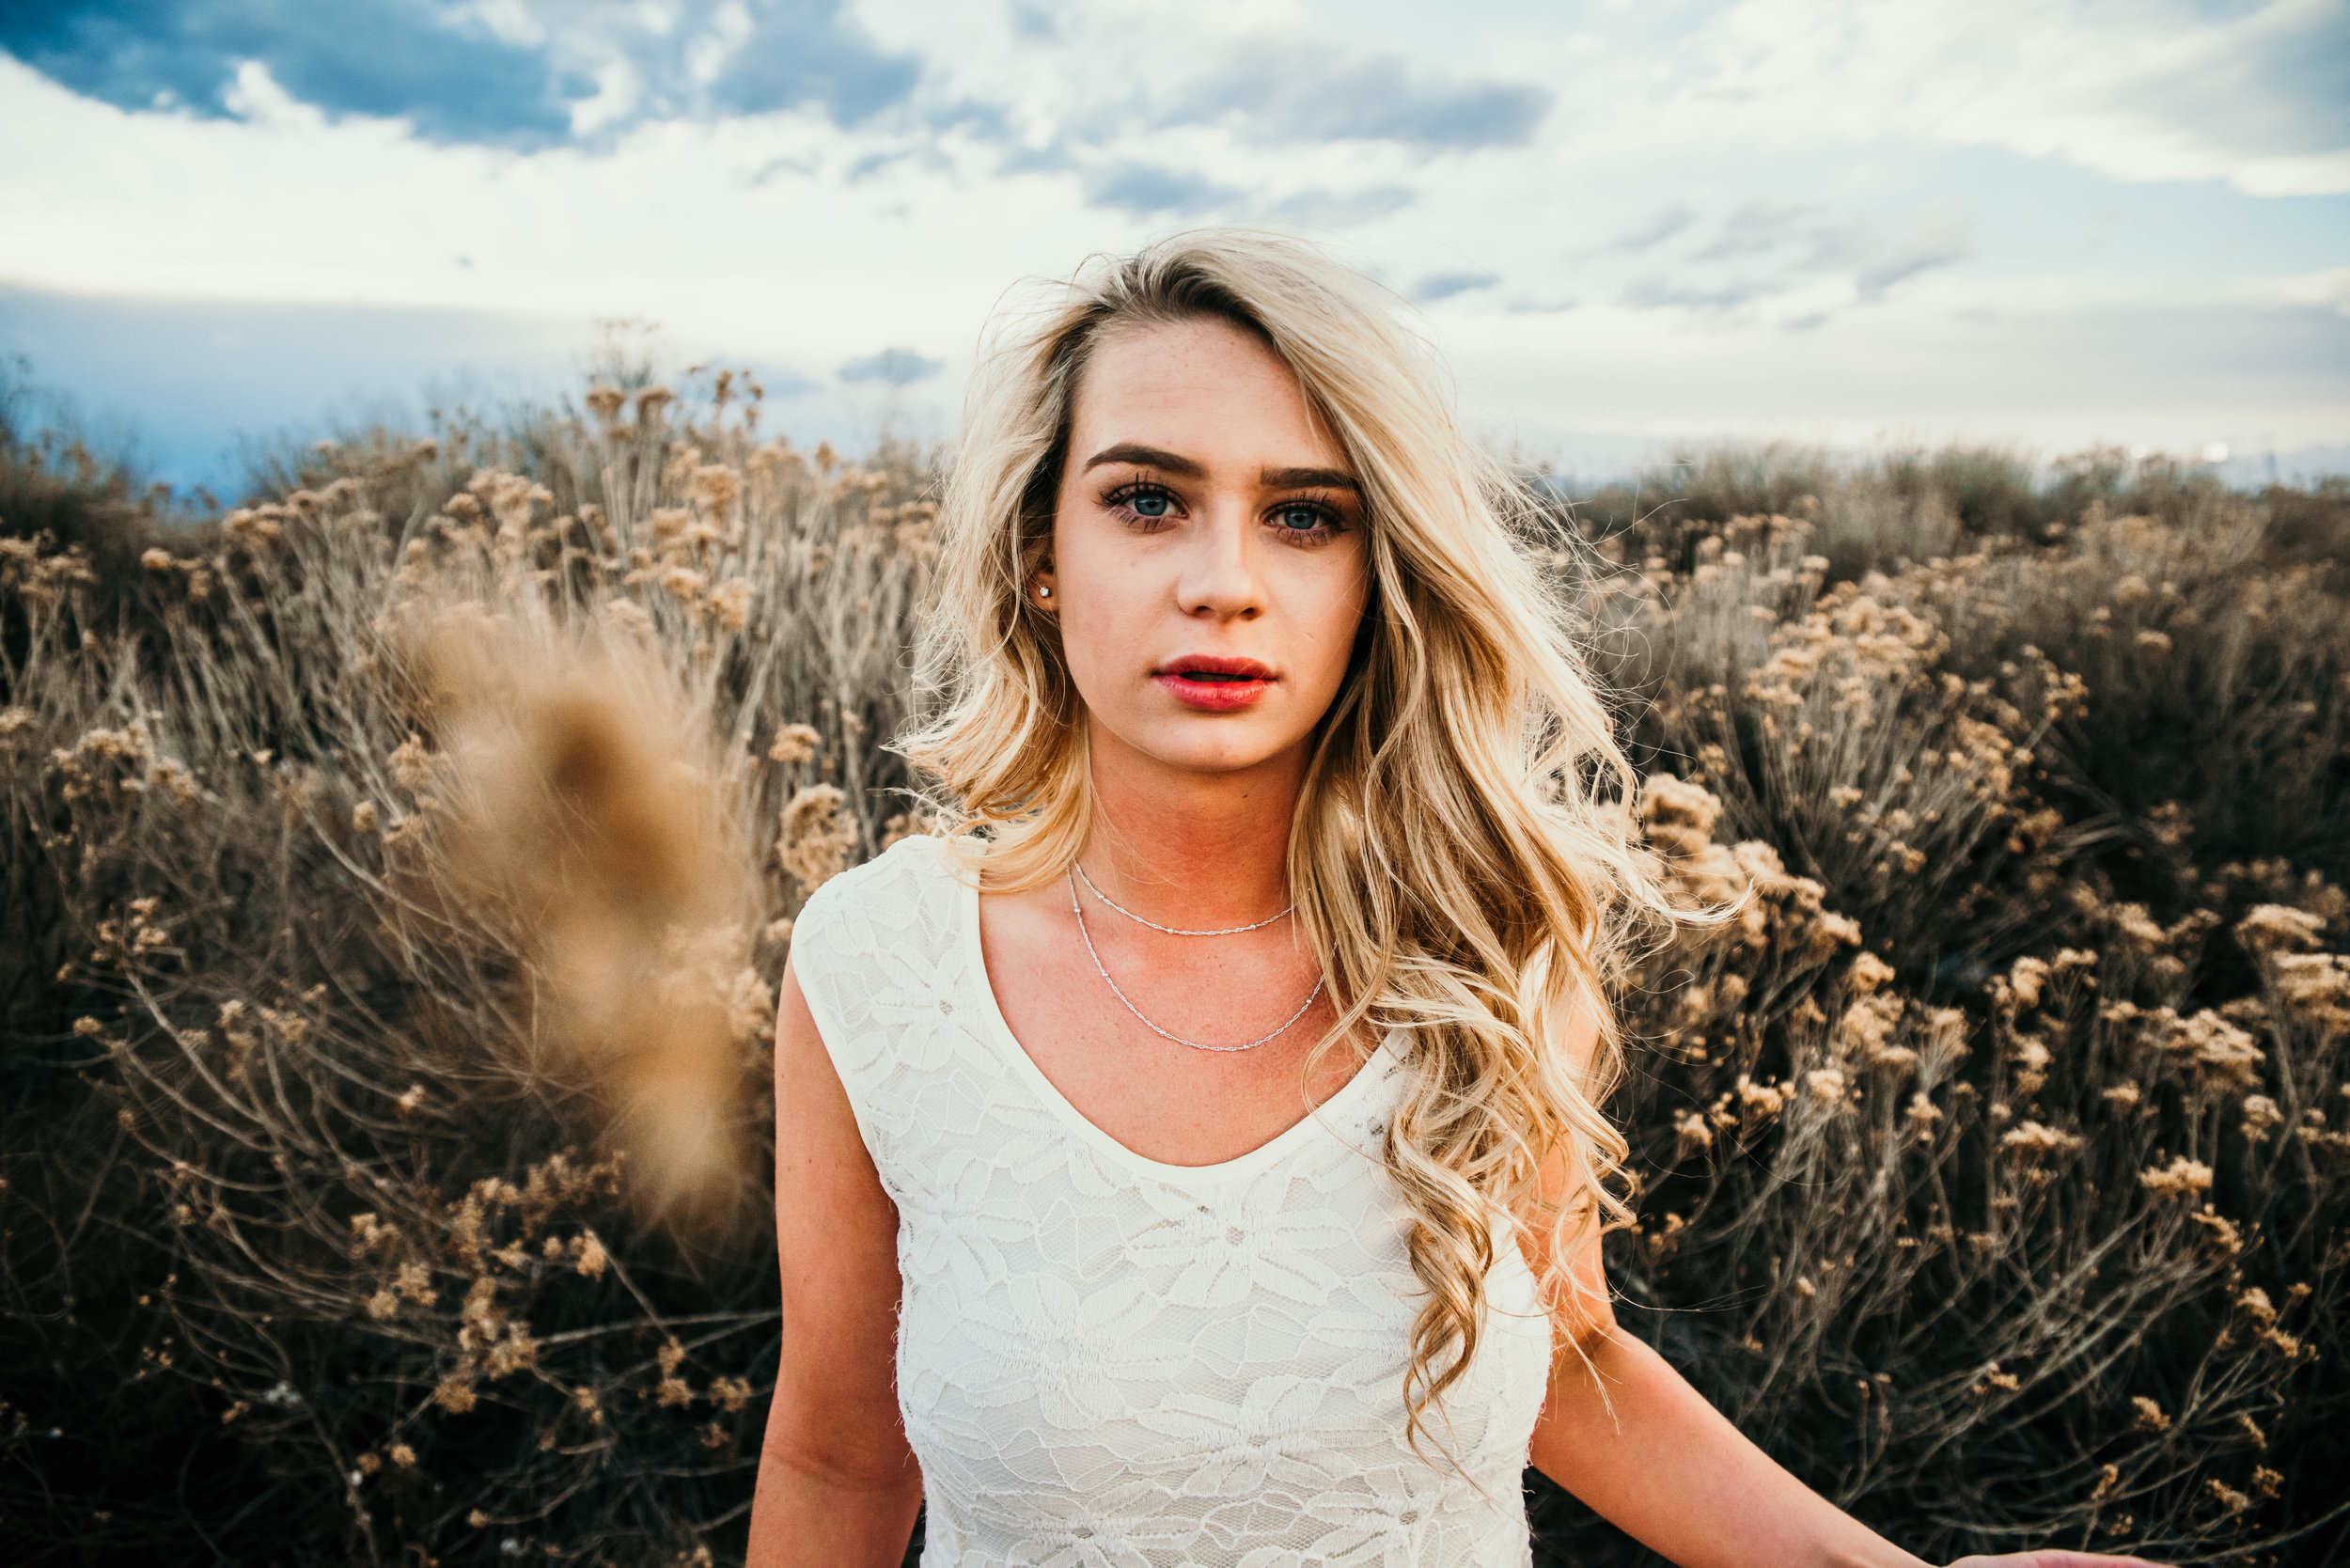 Miss. Miller's Photography | Colorado Senior Photographer | senior photo ideas | modern senior photos | senior photos for girls | girls wild flowers photo shoots ideas